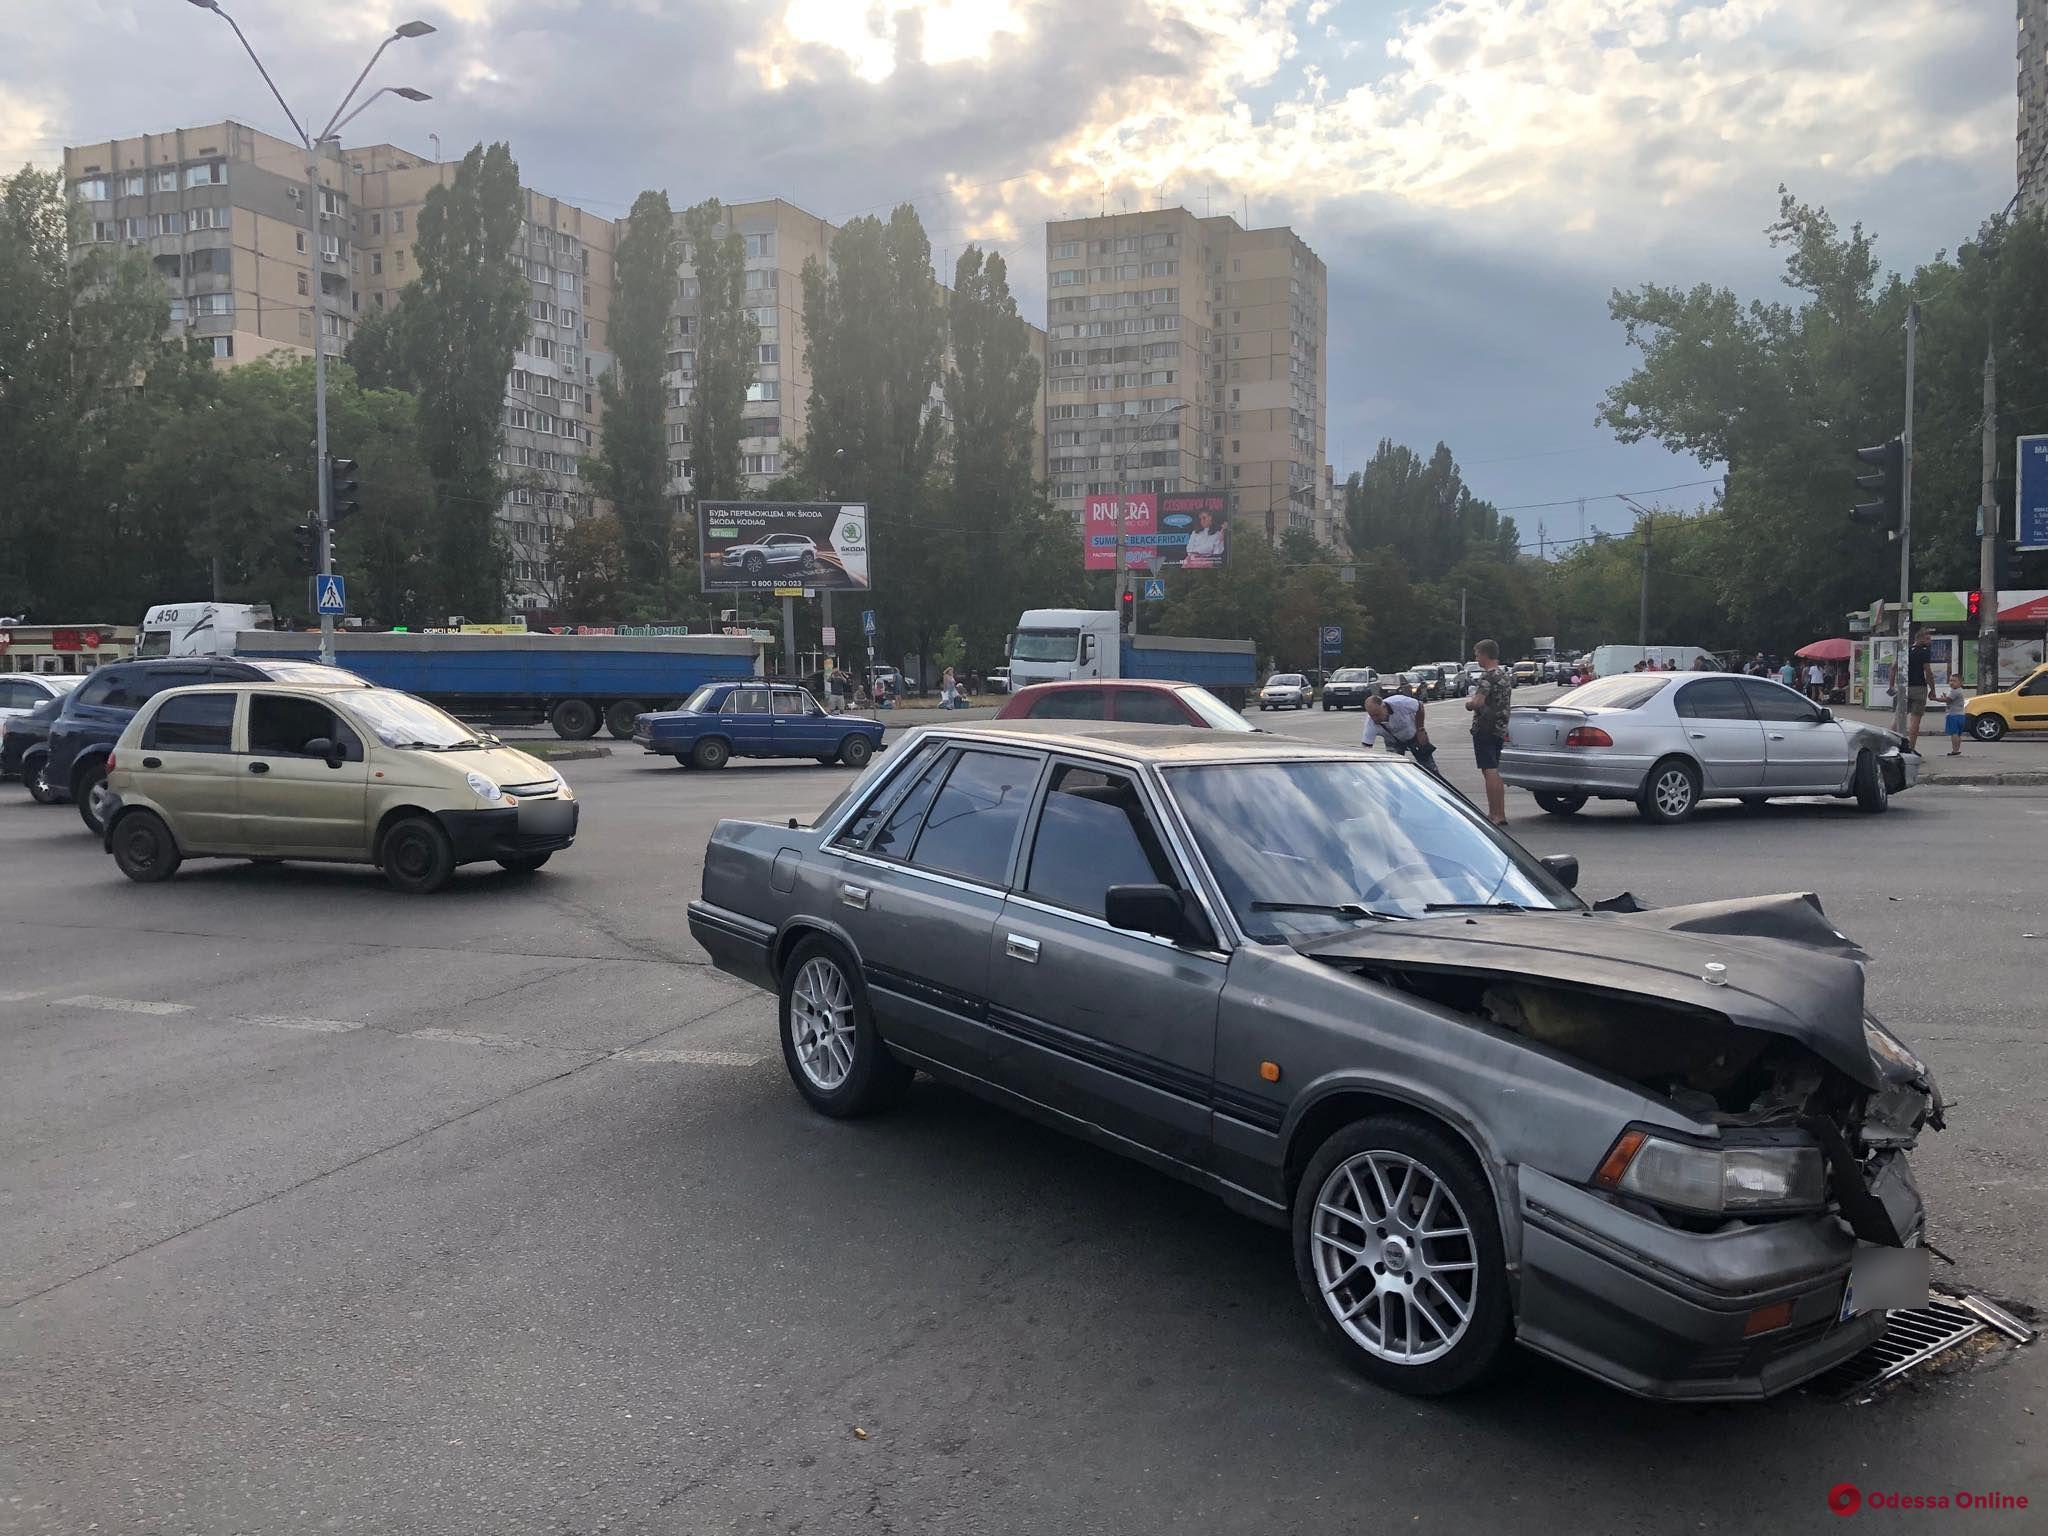 На поселке Котовского не поделили дорогу две легковушки